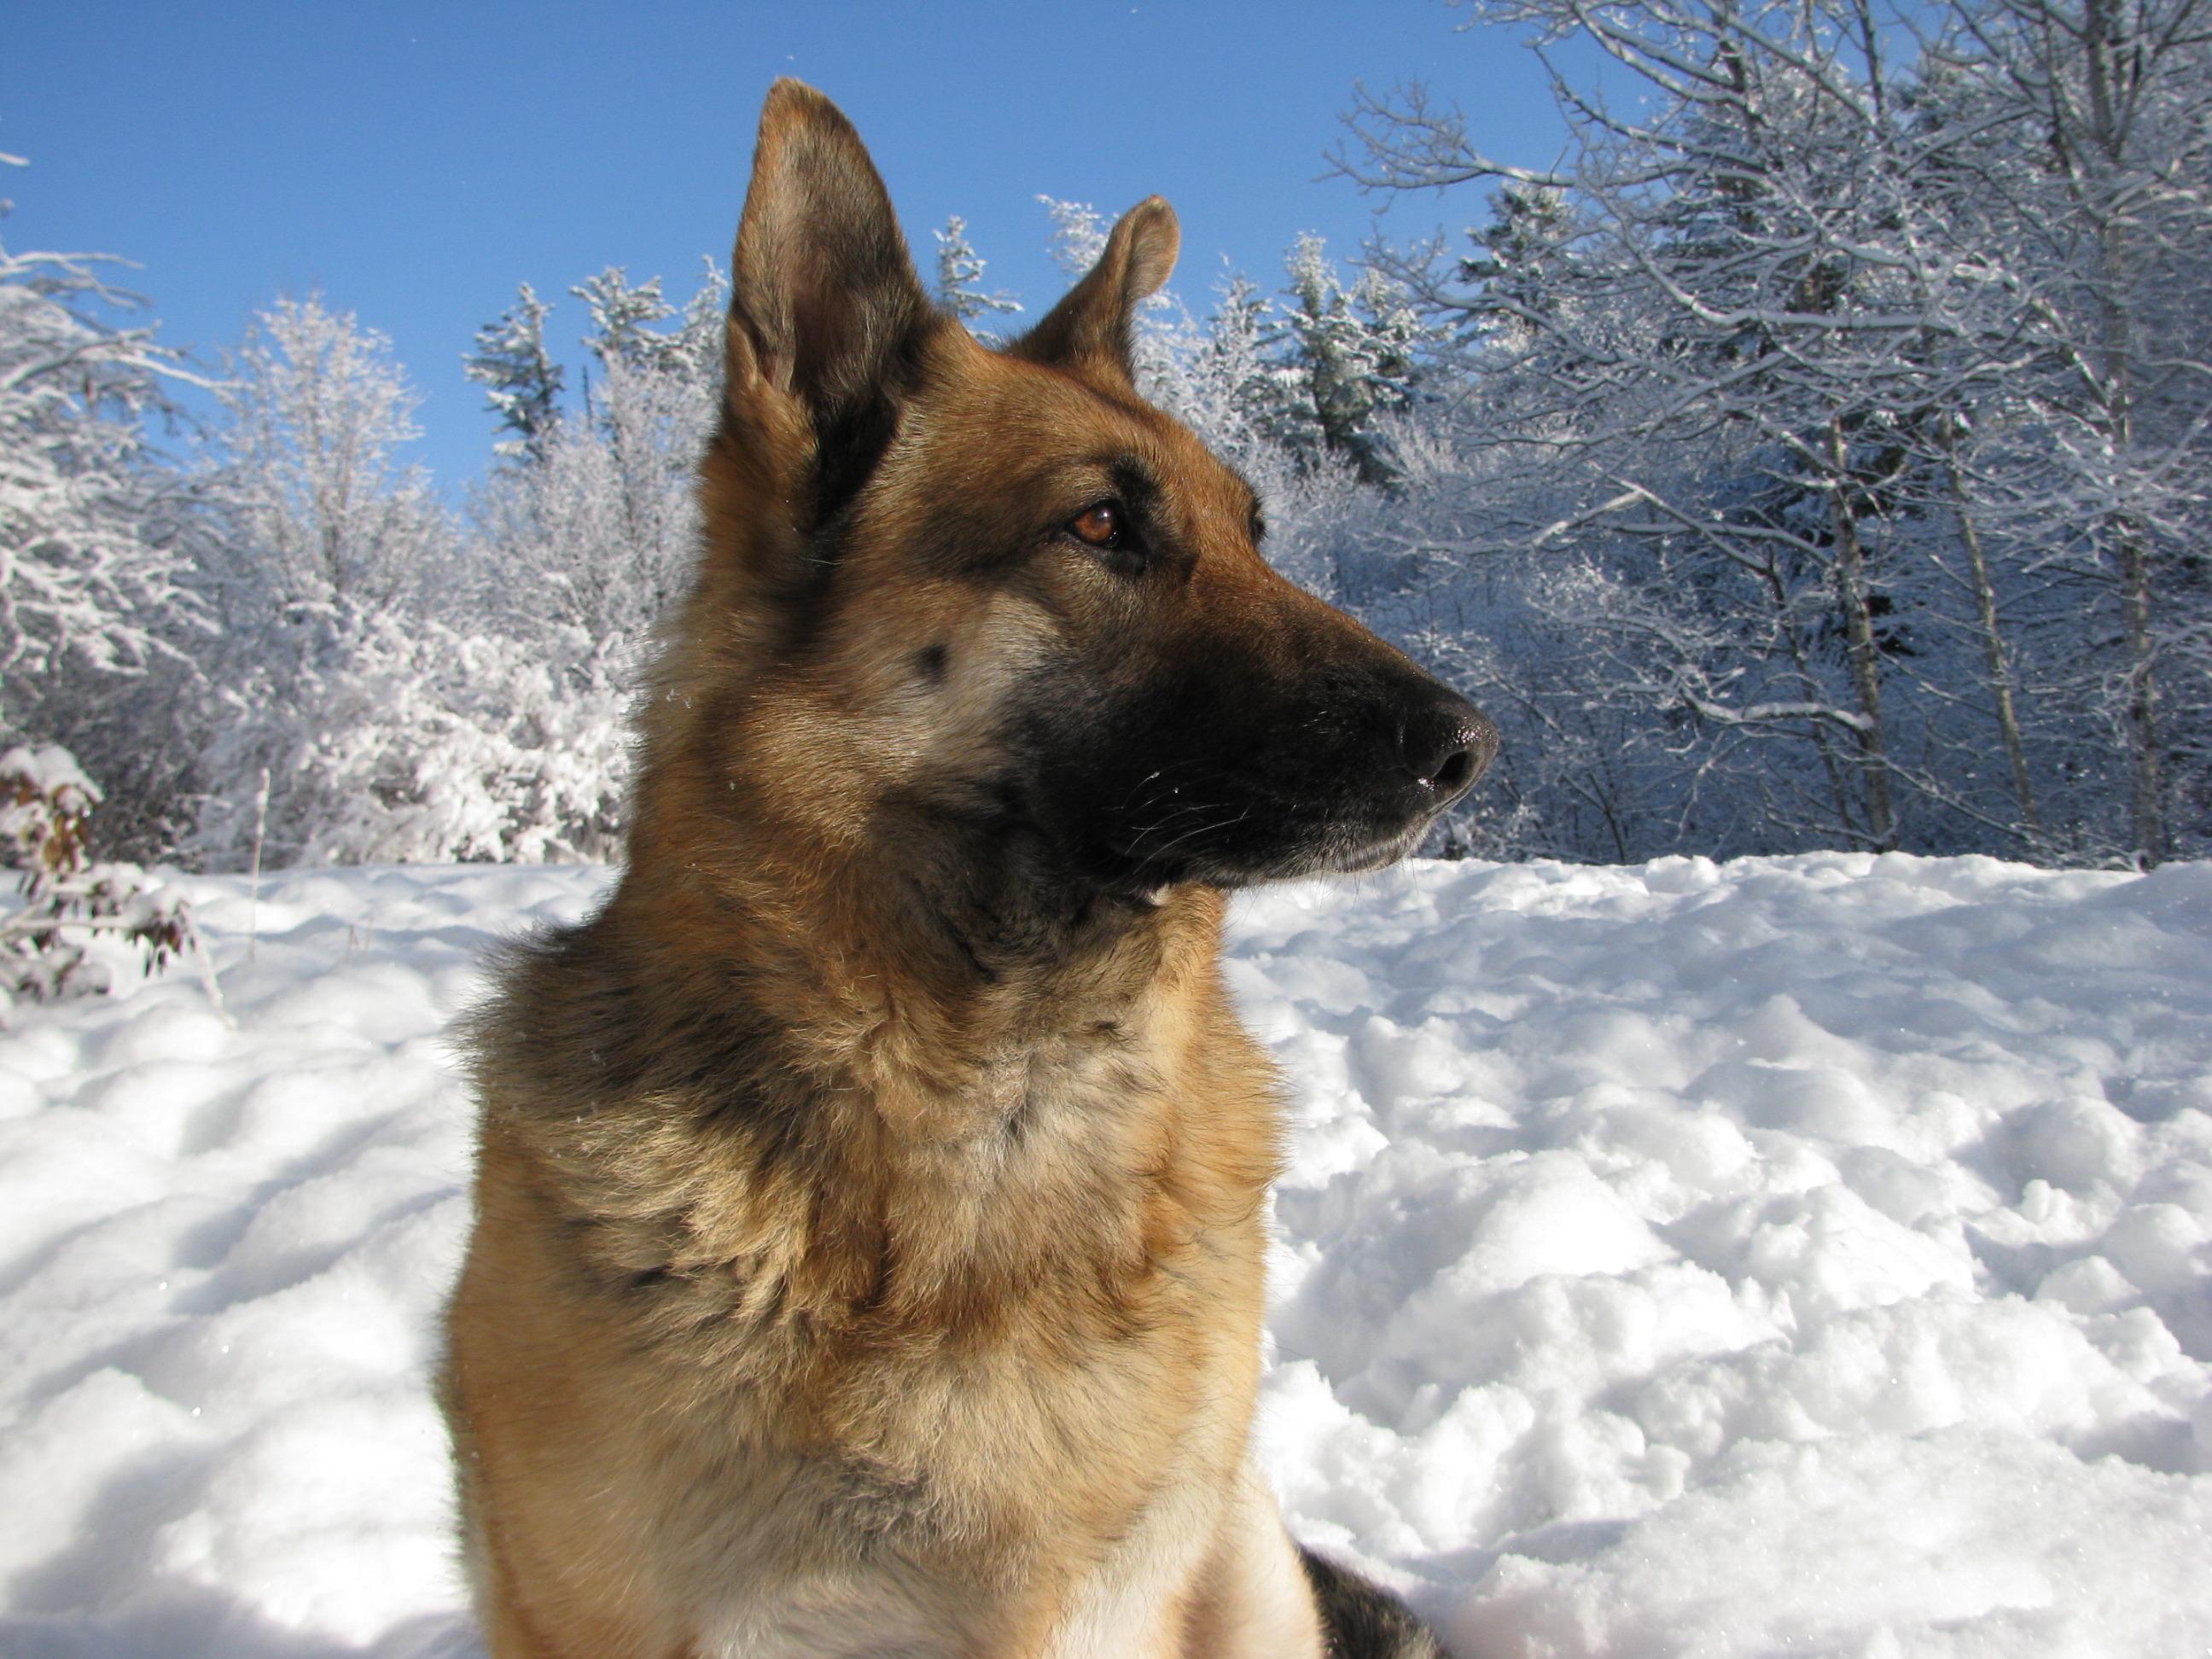 Овчарка в снегу  № 836533 загрузить